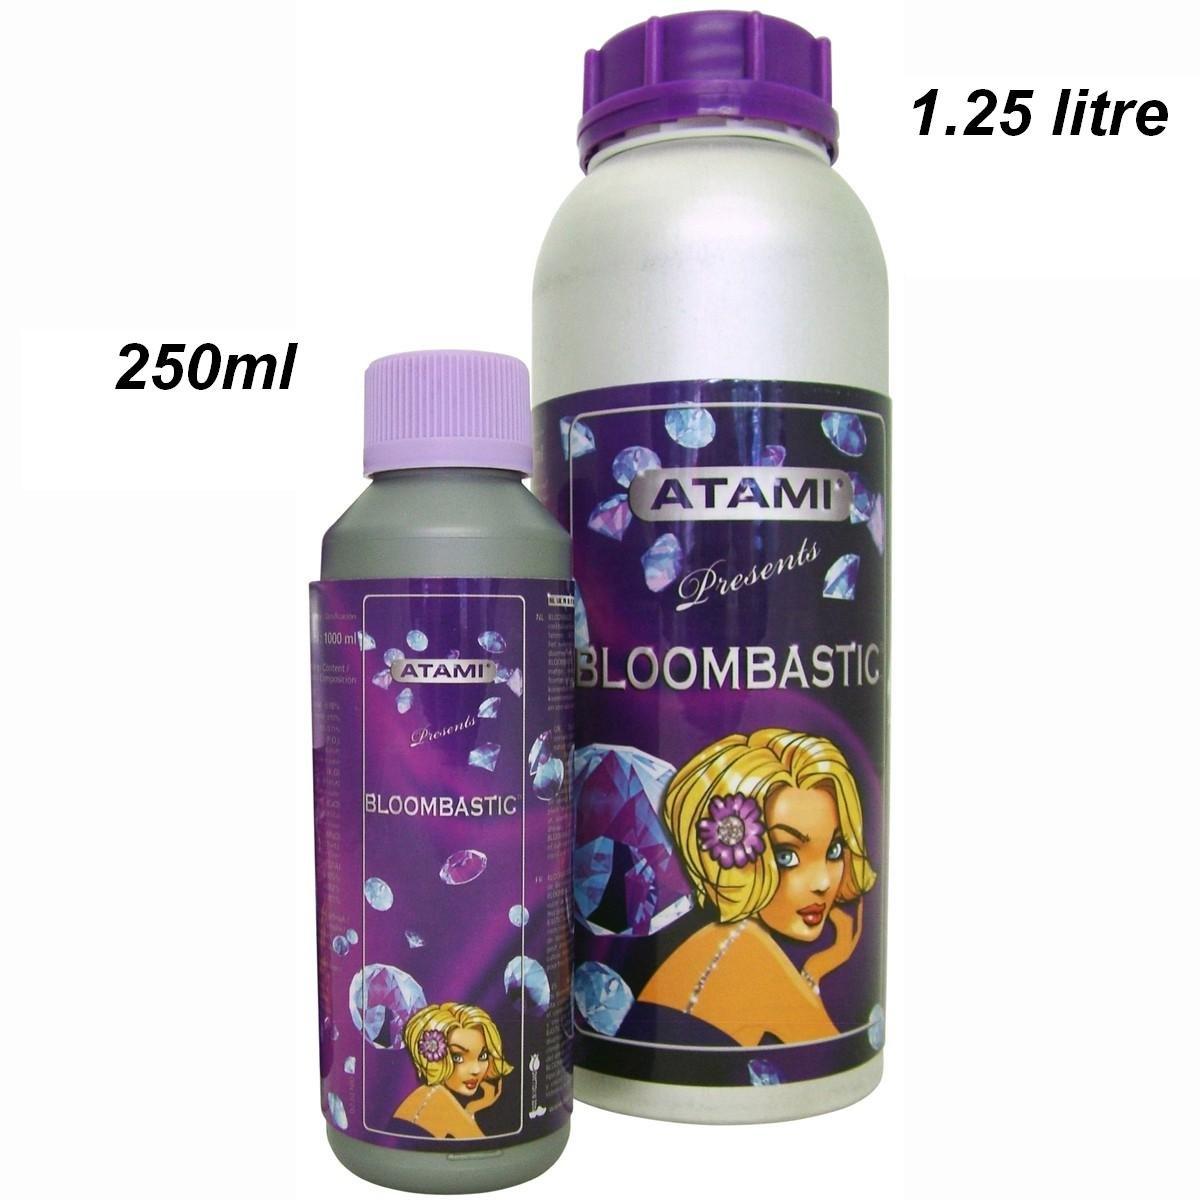 Atami Bloombastic 1.25ltr